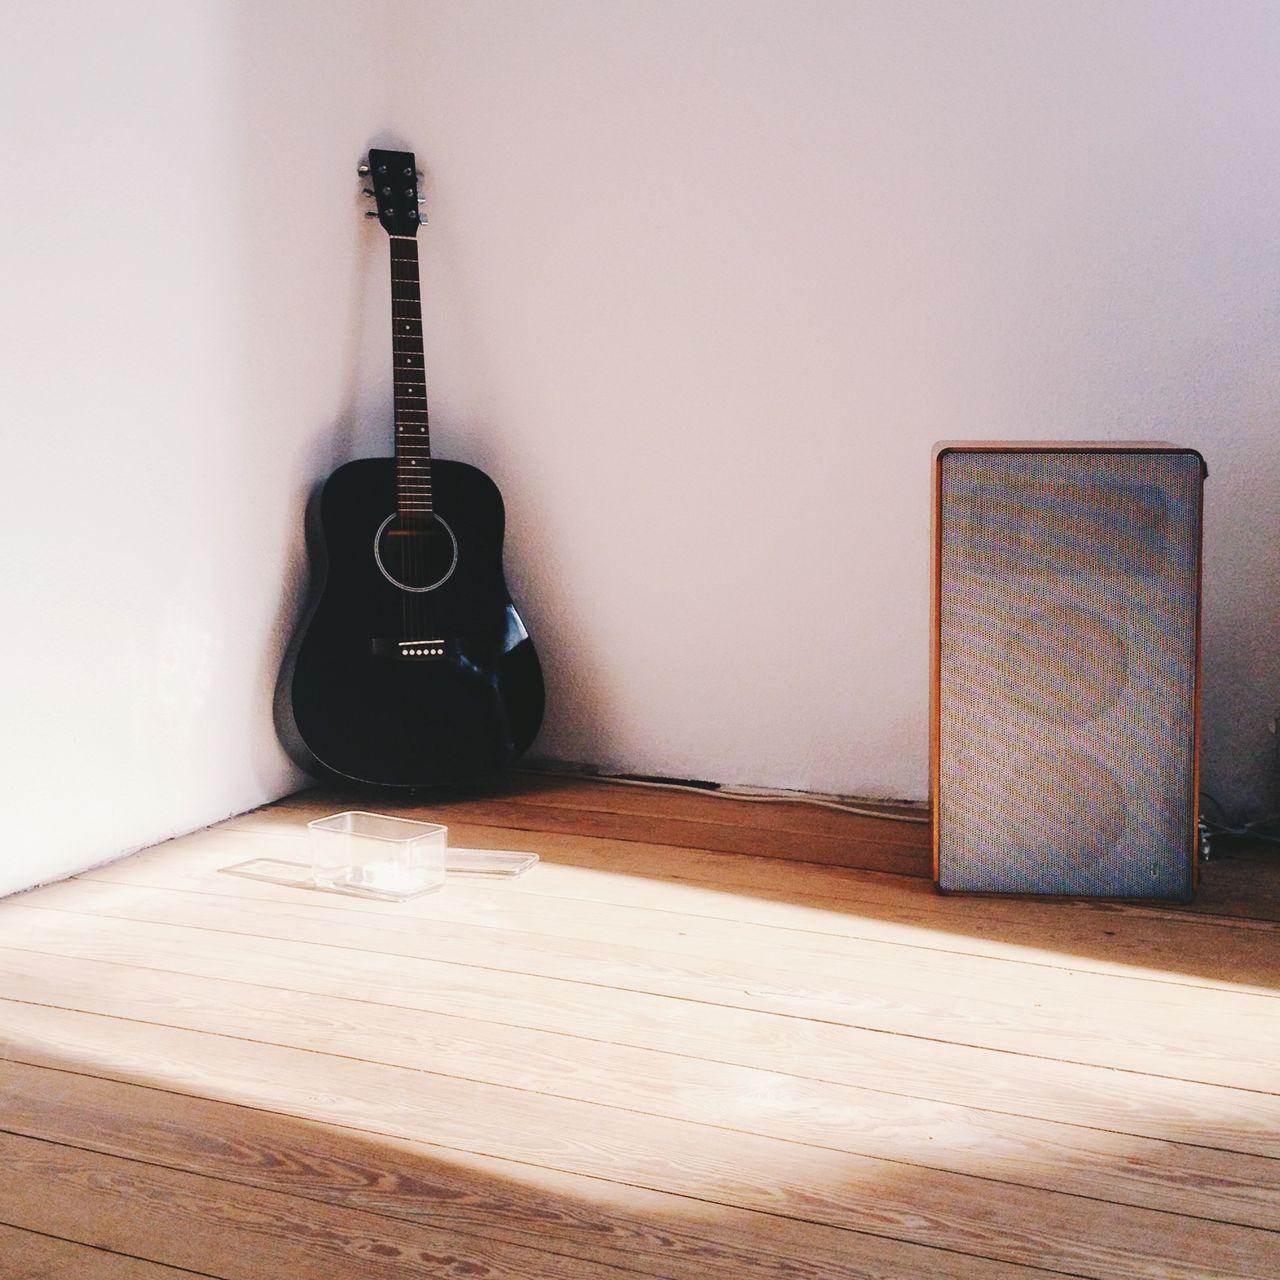 Guitar and speaker on hardwood floor